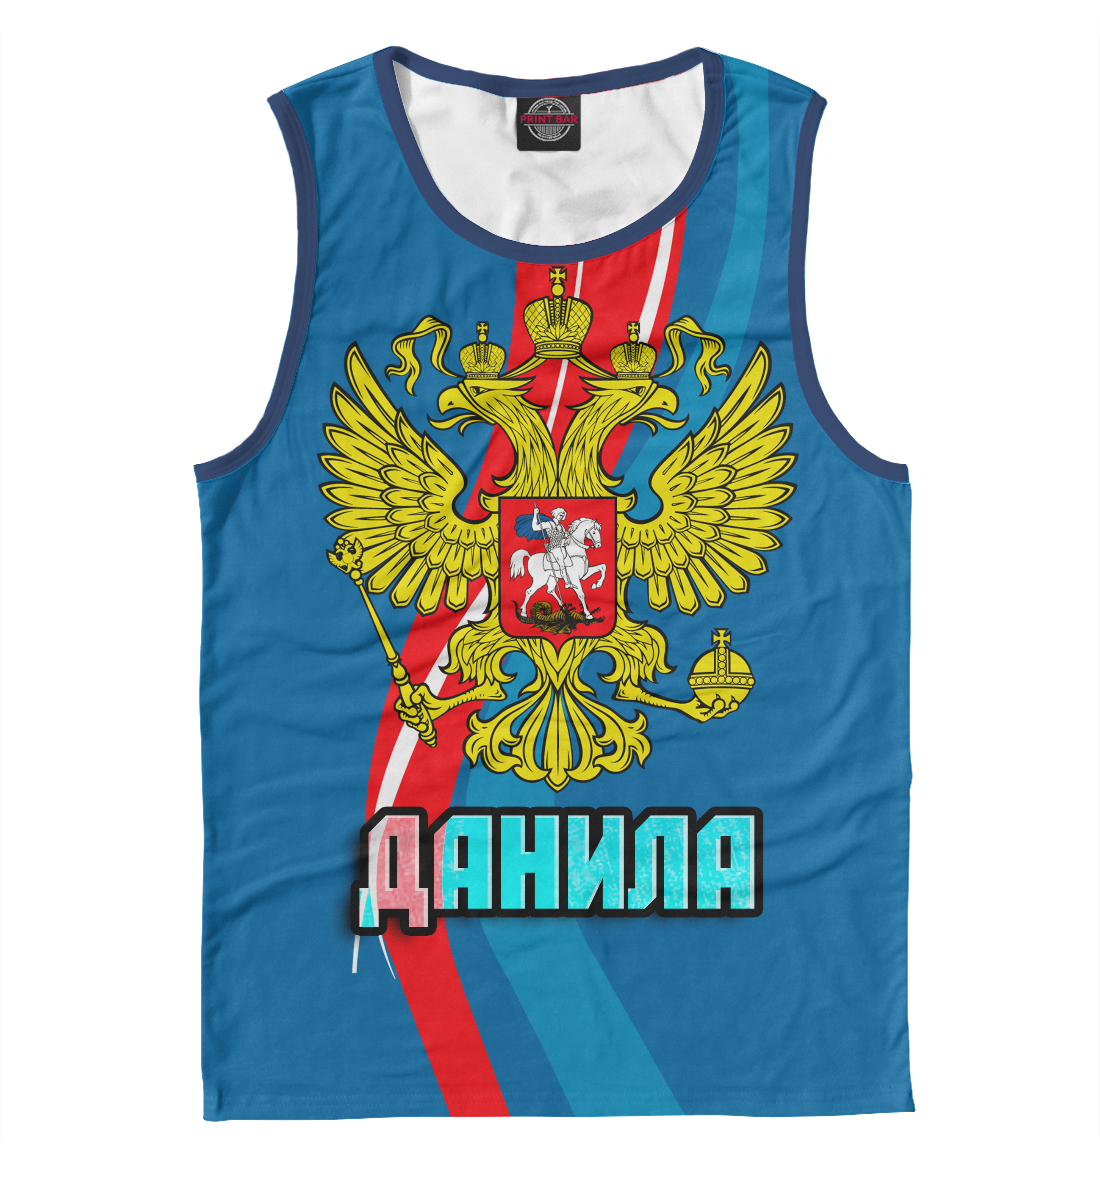 Купить Герб Данила, Printbar, Майки, DAN-632215-may-2